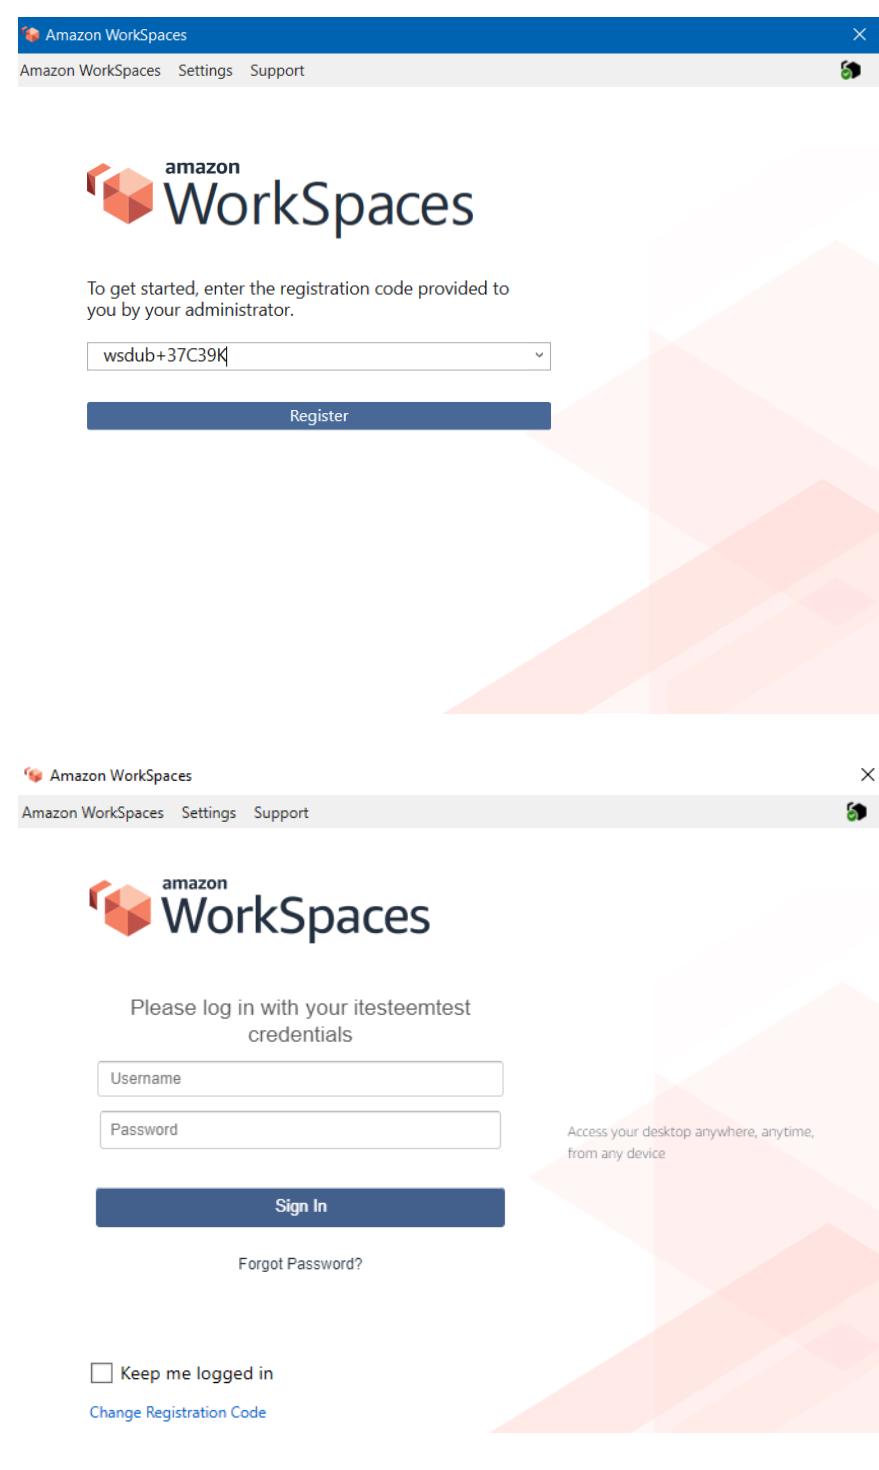 Amazon WorkSpaces login 12